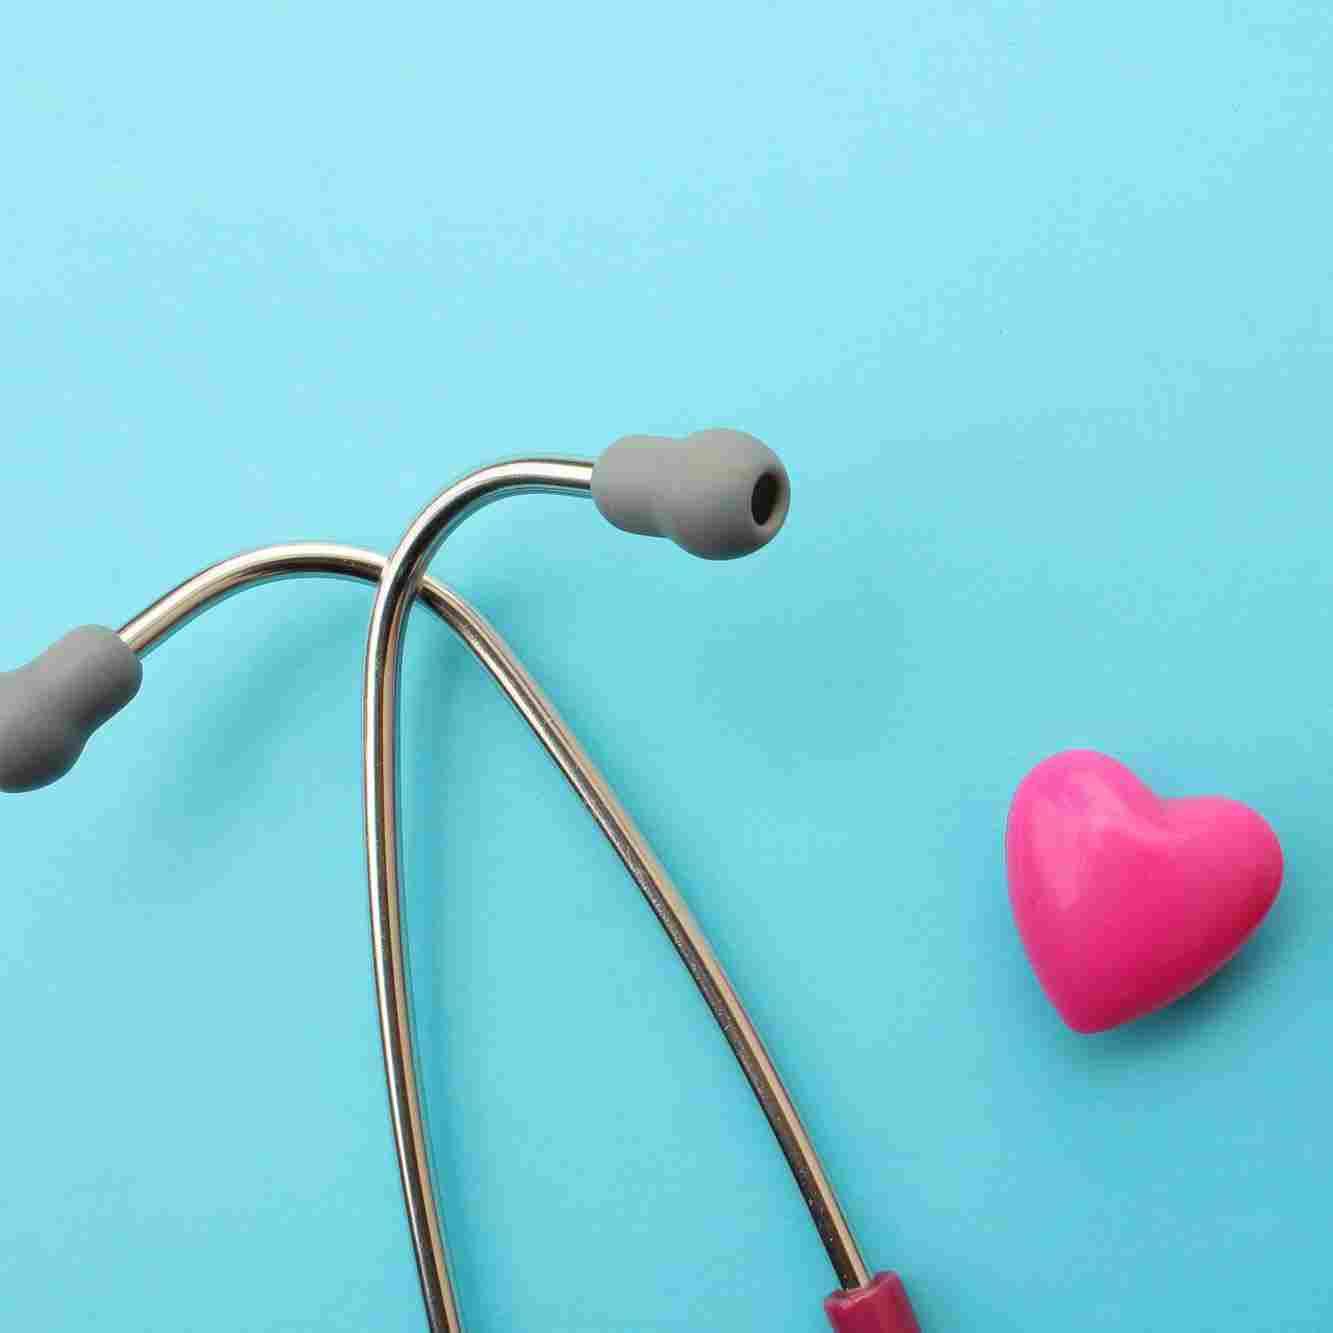 https://gematolog.ck.ua/wp-content/uploads/2015/12/srce-i-stetoskop.jpg